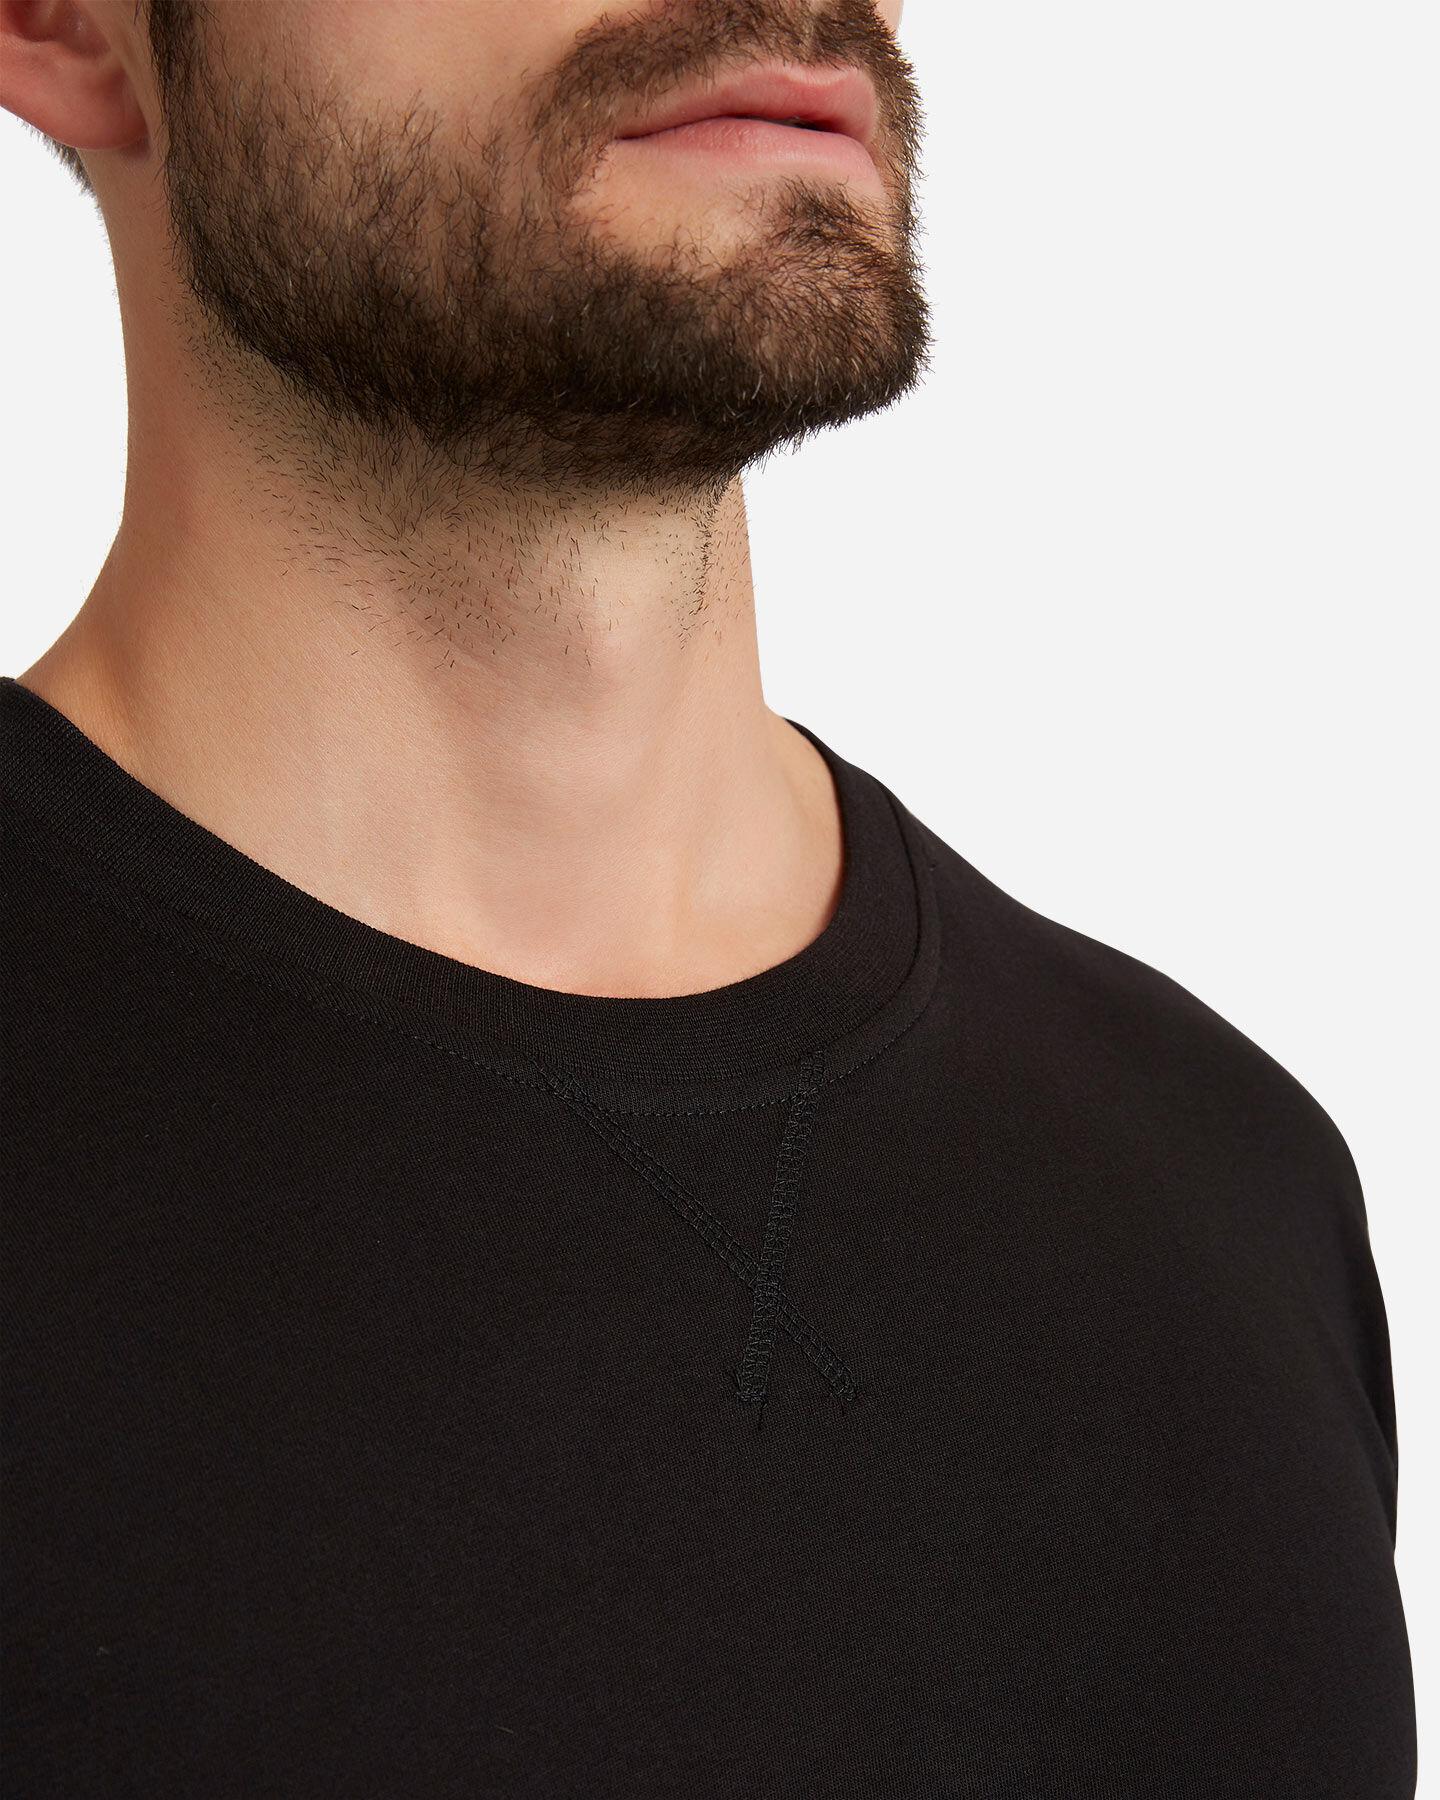 T-Shirt ABC GIROCOLLO M S1298307 scatto 4